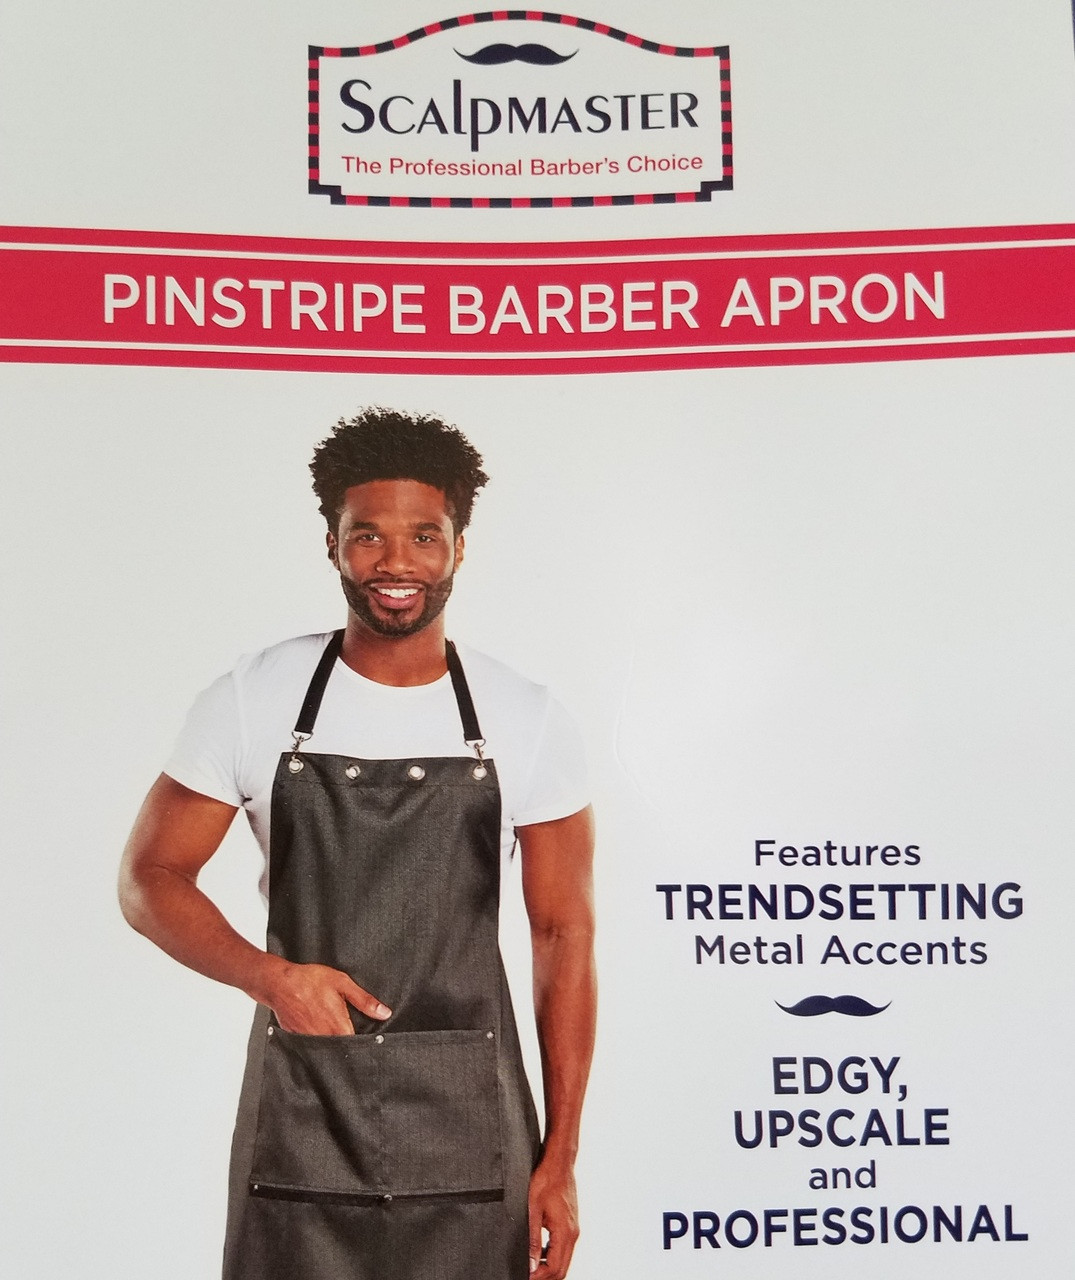 Barber Apron - Pinstripe